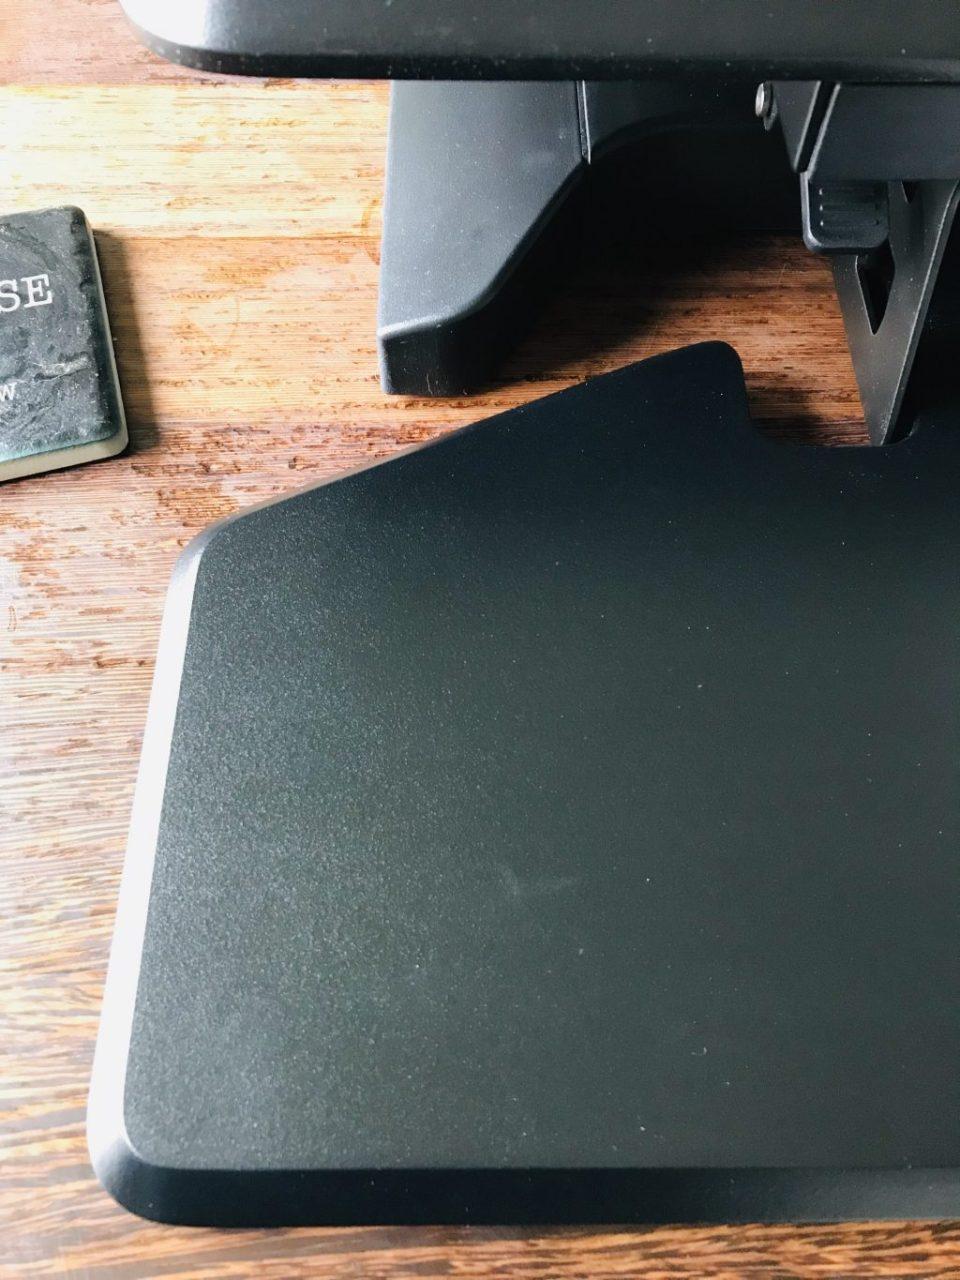 UPLIFTdesk XF Converter - Keyboard Tray Shape